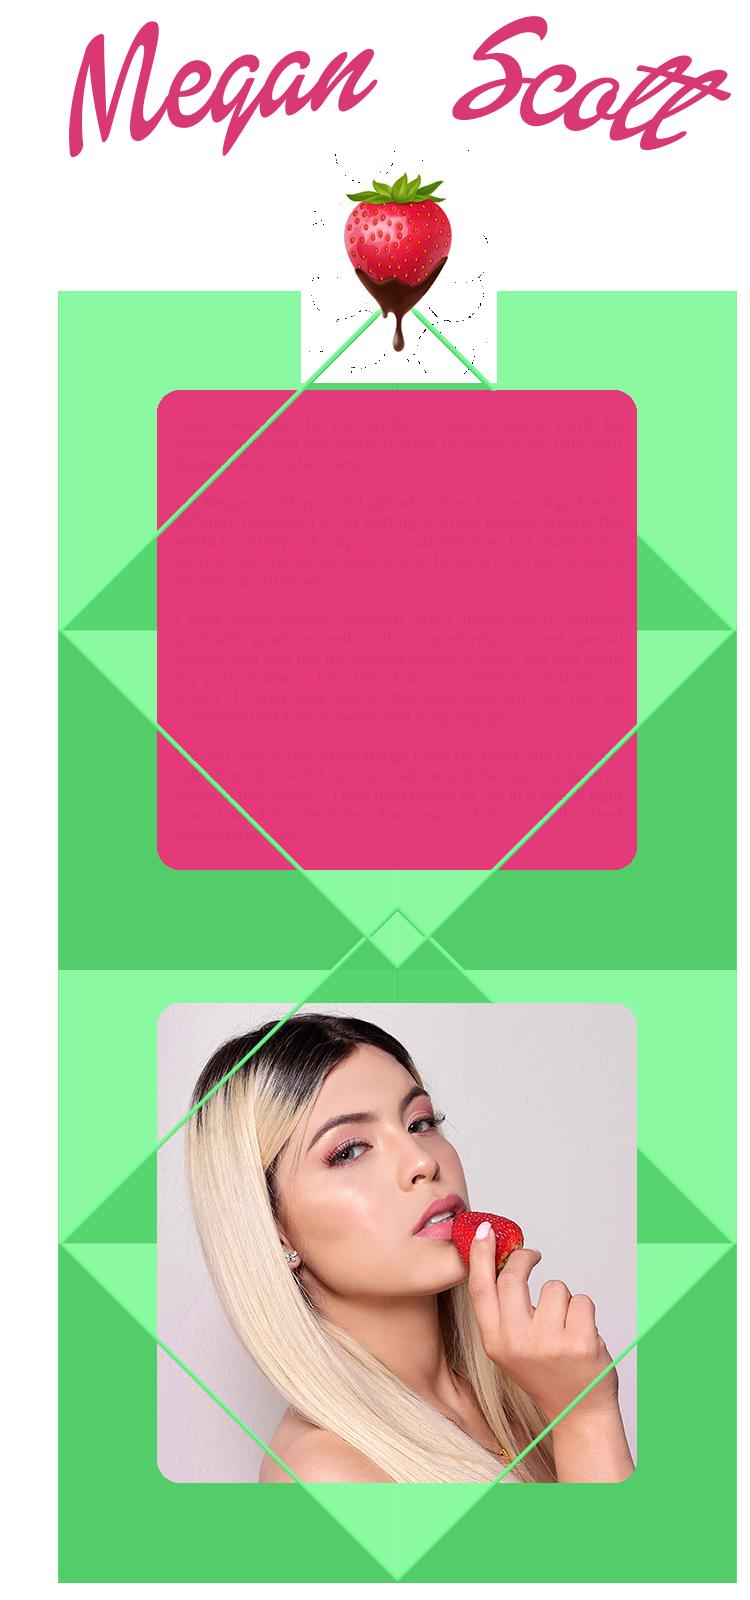 MeganScott profile custom pic 1